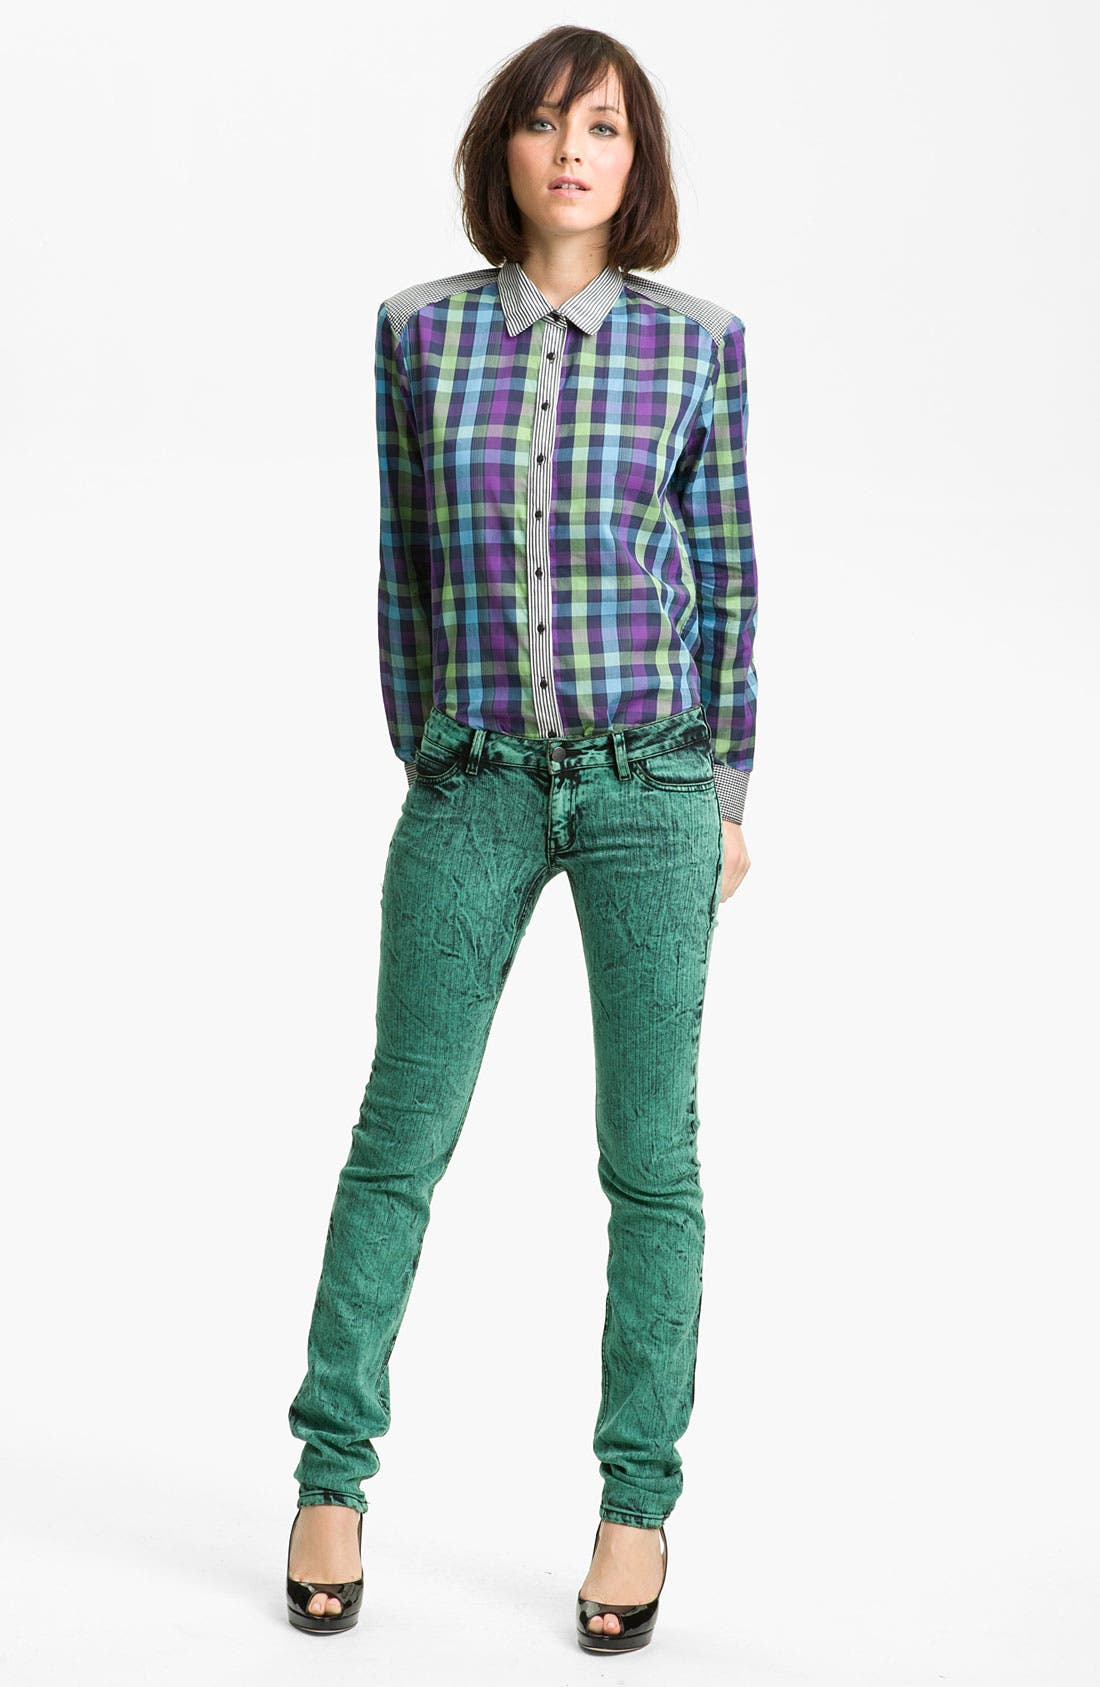 Alternate Image 1 Selected - Kelly Wearstler 'Tito' Flannel Shirt